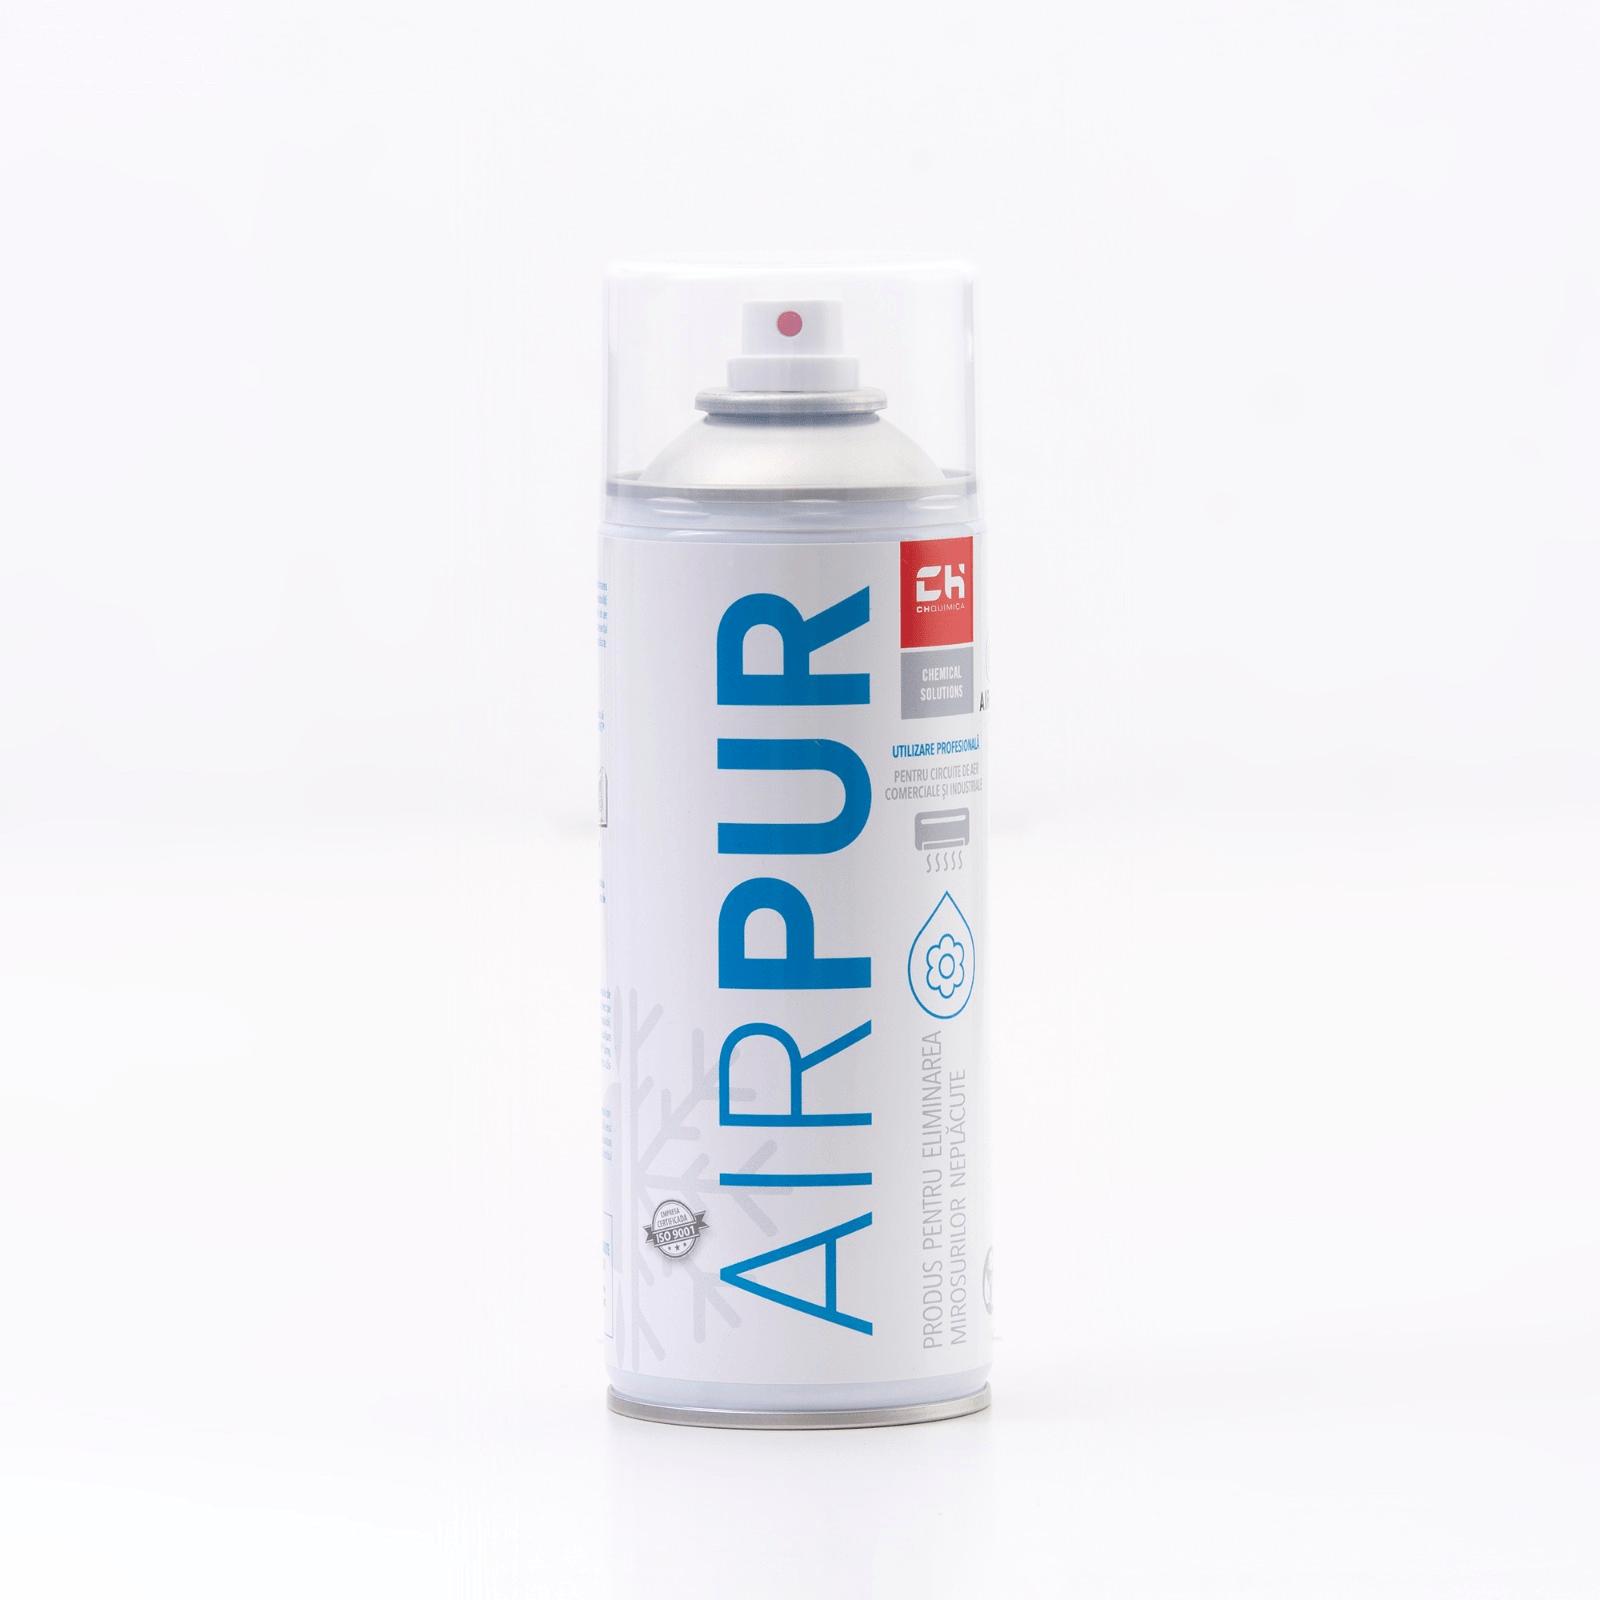 Airpur spray pentru aer conditionat, elimina mirosurile  neplacut